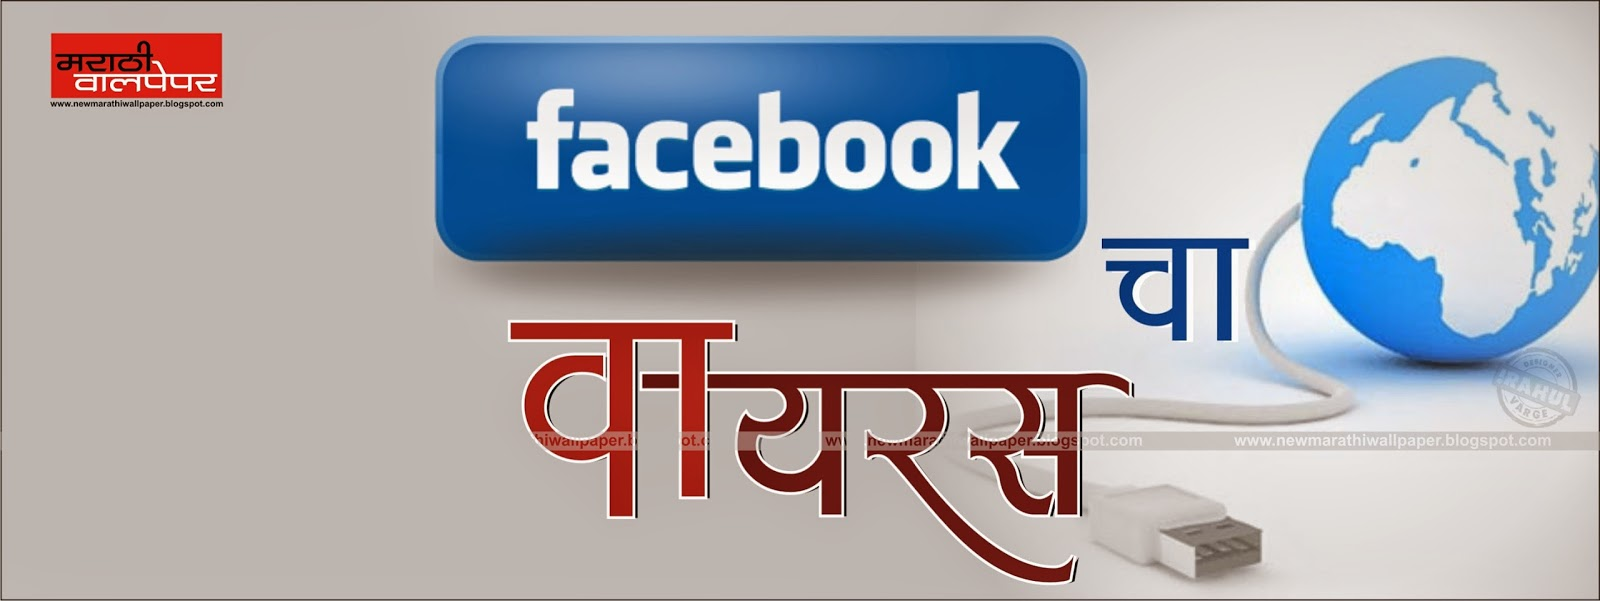 Facebook cha Virus + New Marathi Wallpaper - Marathi Wallpaper